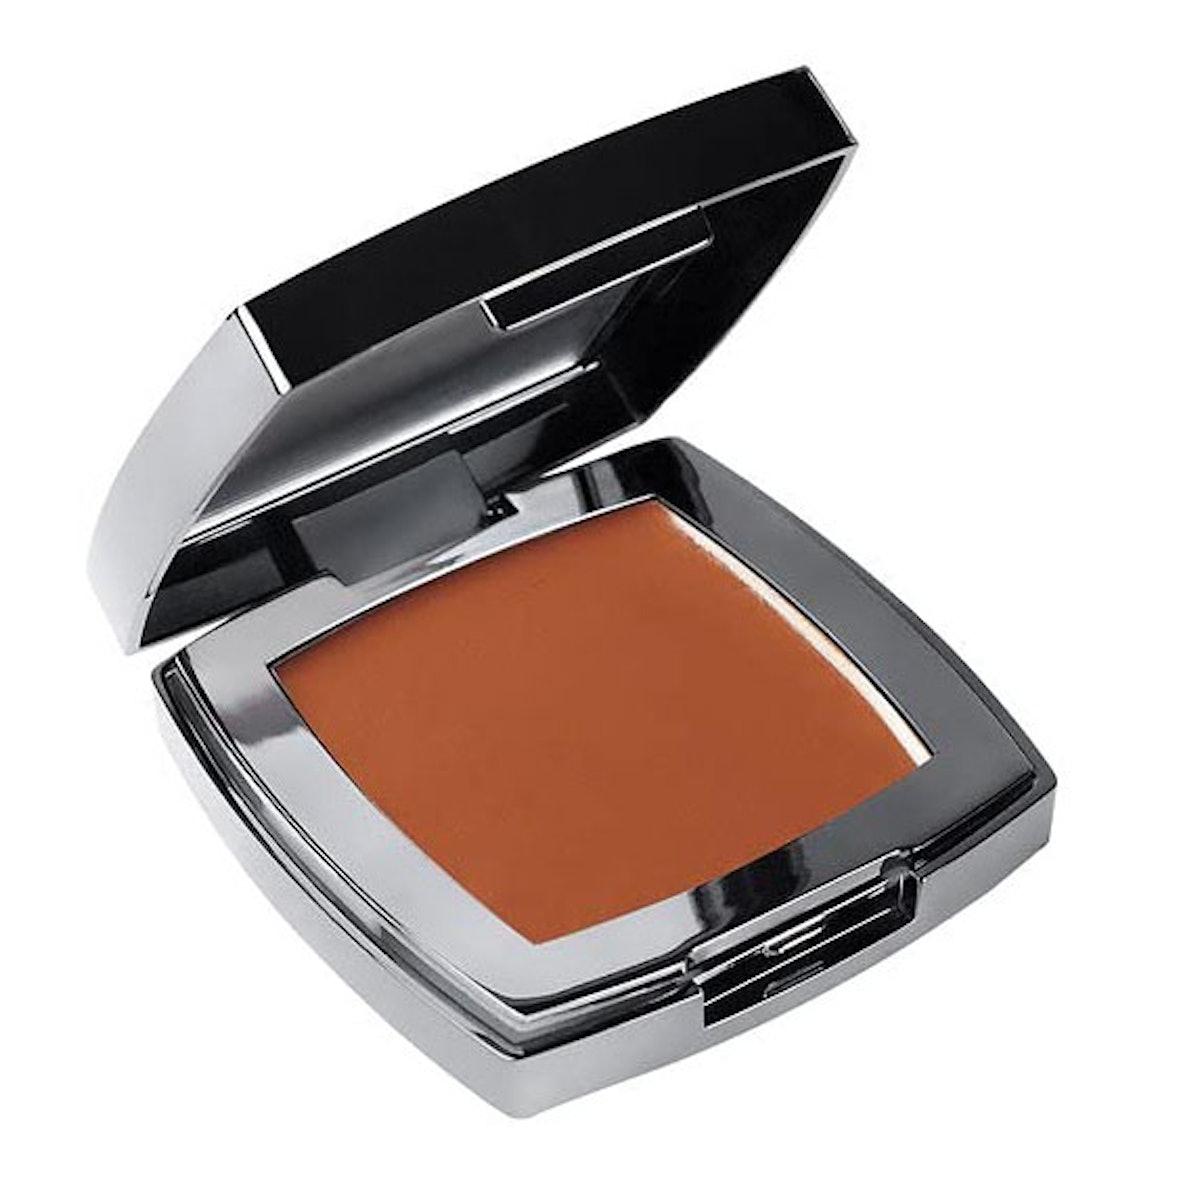 AJ Crimson Dual Skin Creme Foundation